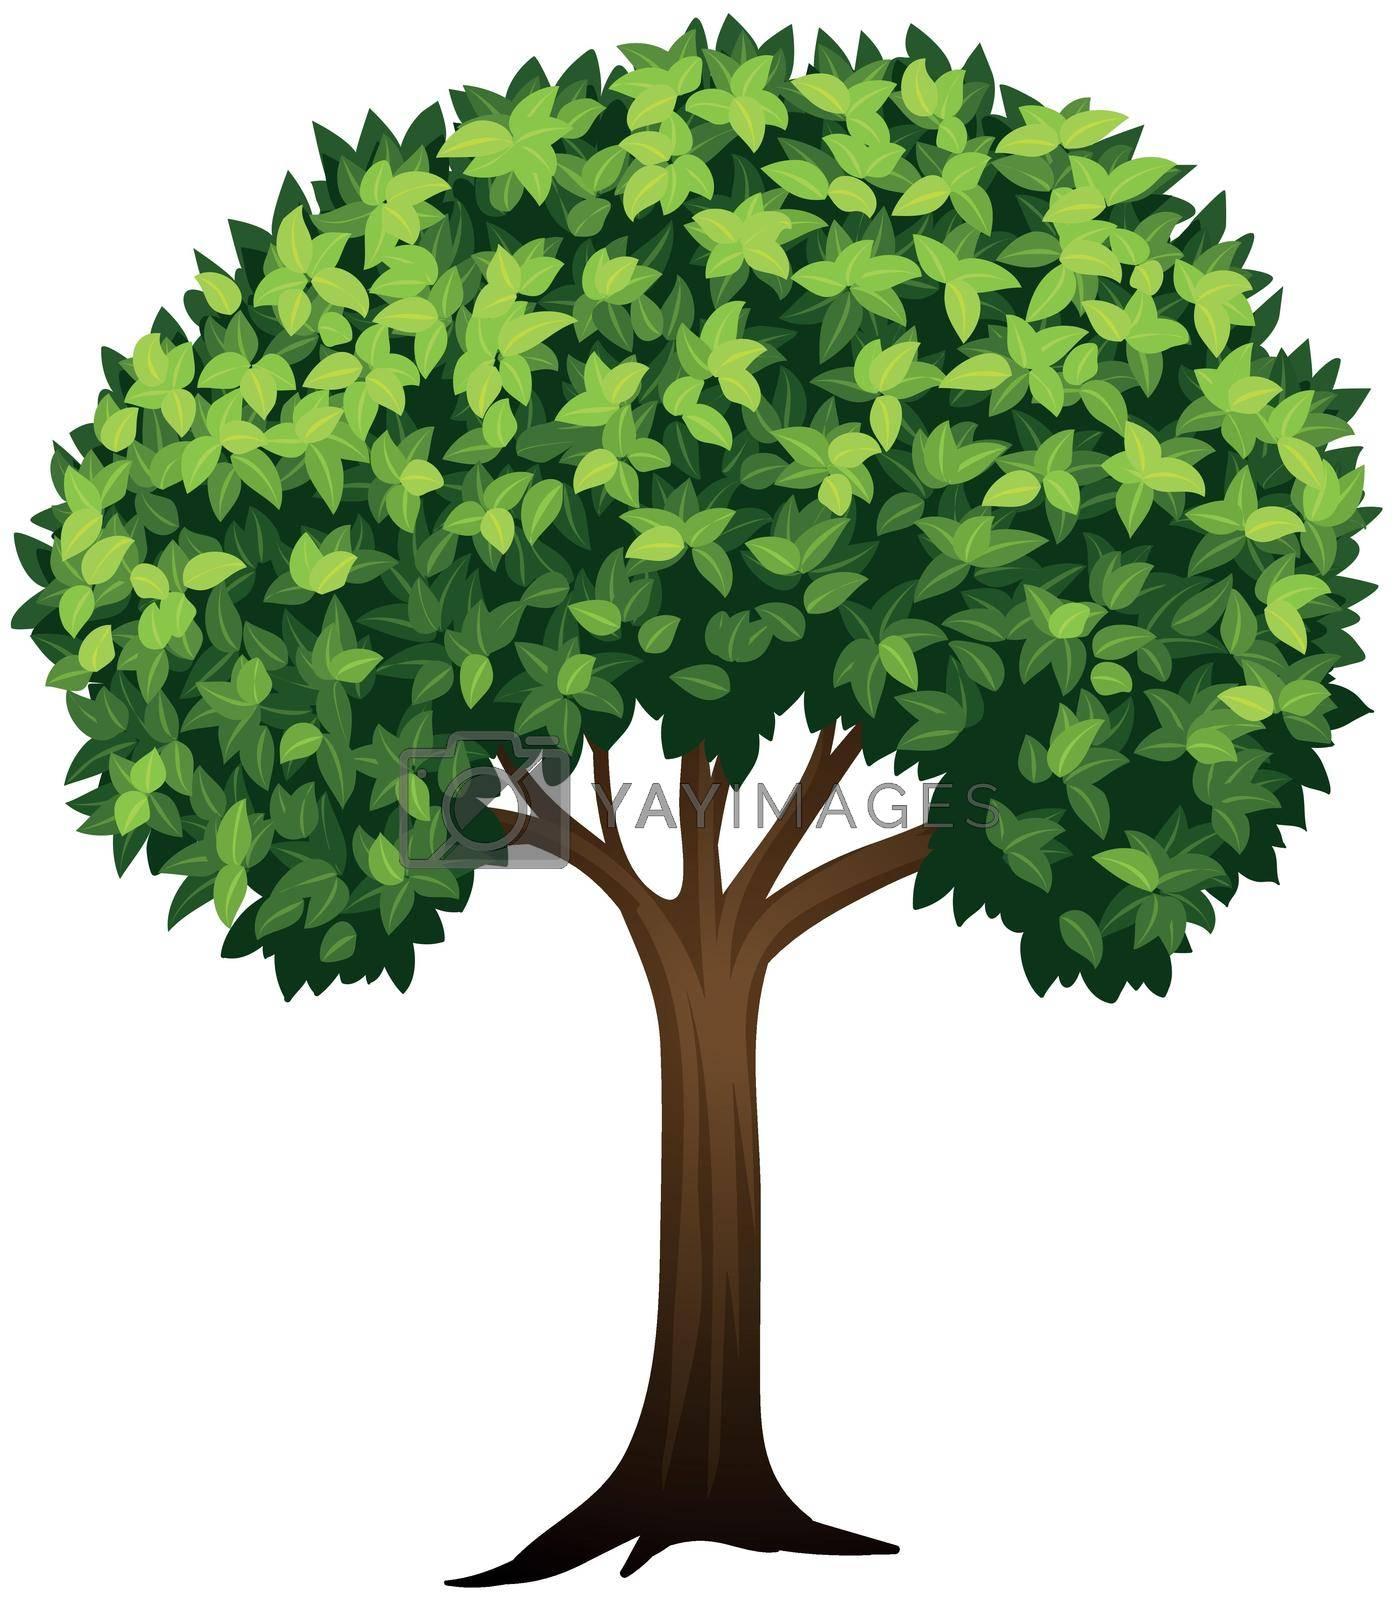 Leafy green tree white background illustration